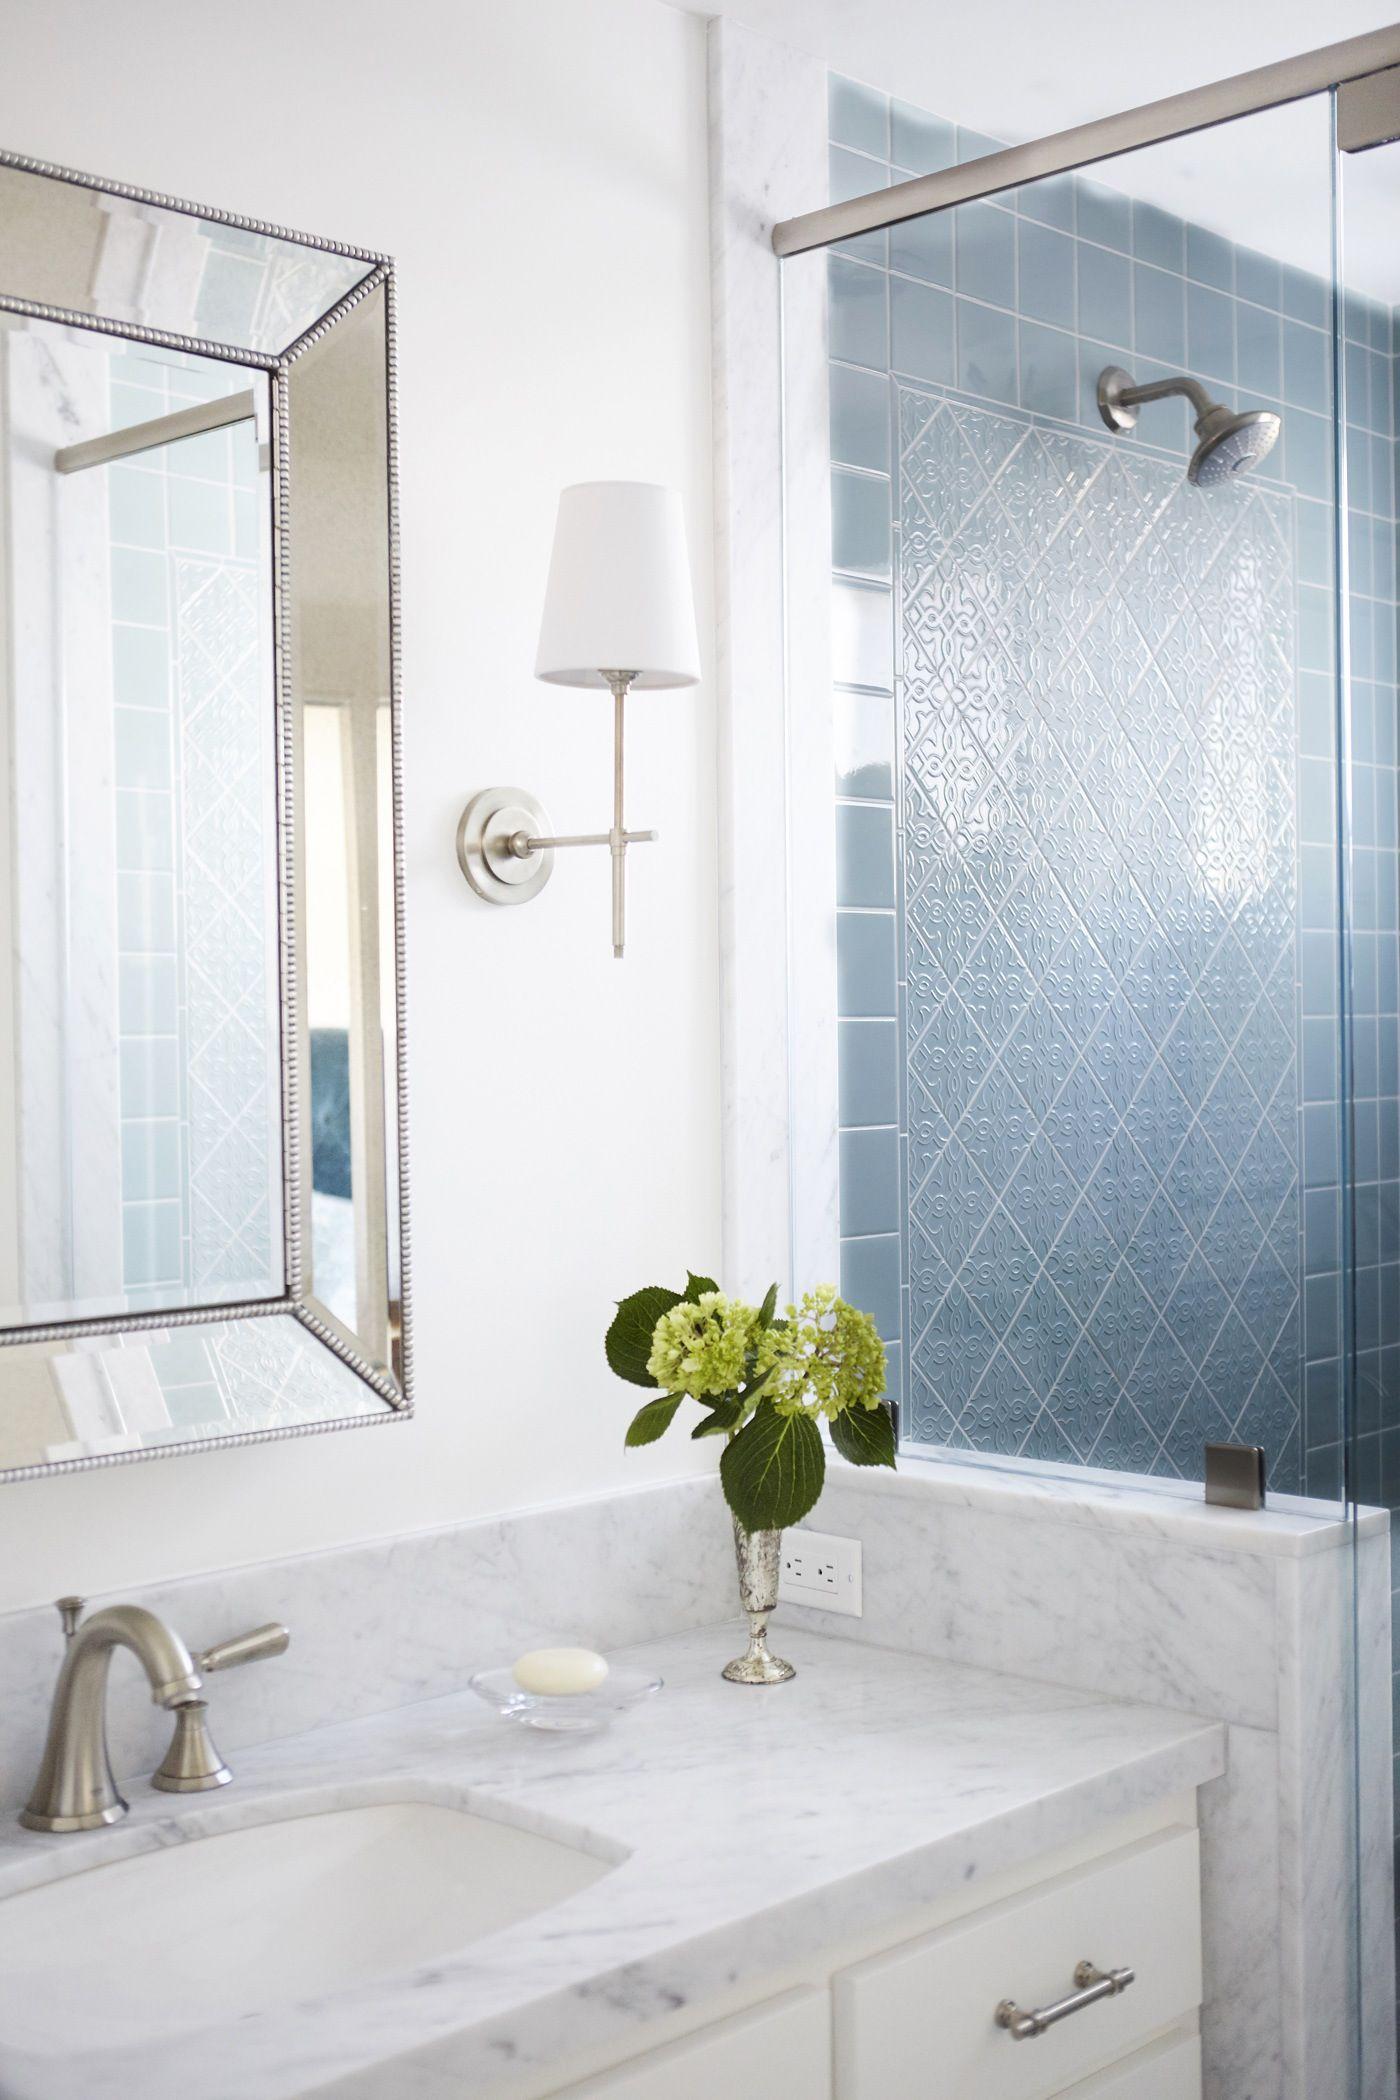 30 Baths With Colorful Tile Blue Shower Tile Green Shower Tile Moroccan Inspired Bathroom